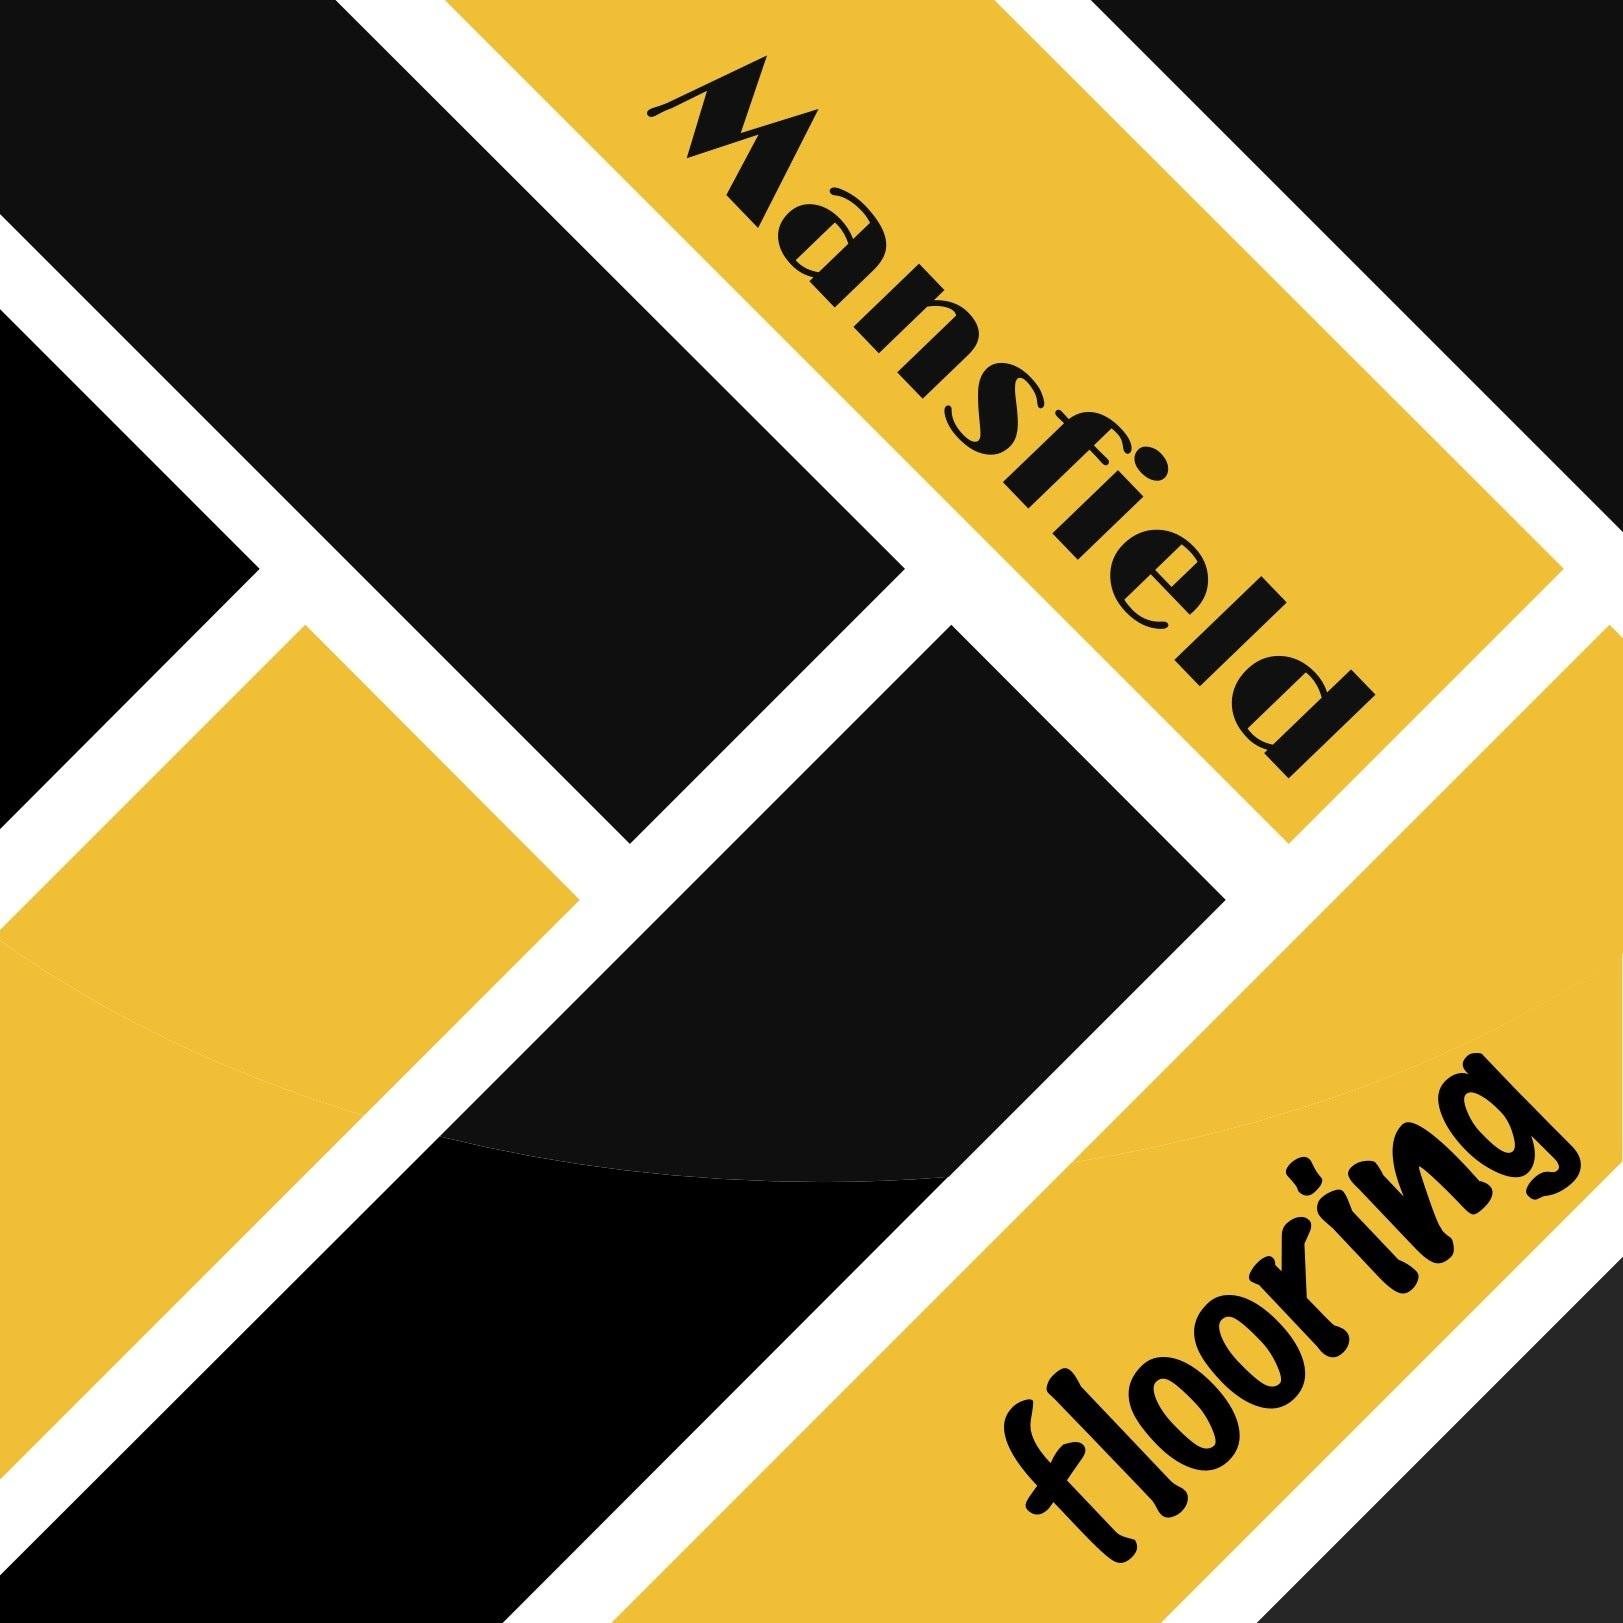 Mansfield Flooring In Mansfield TX 76063 ChamberofCommercecom